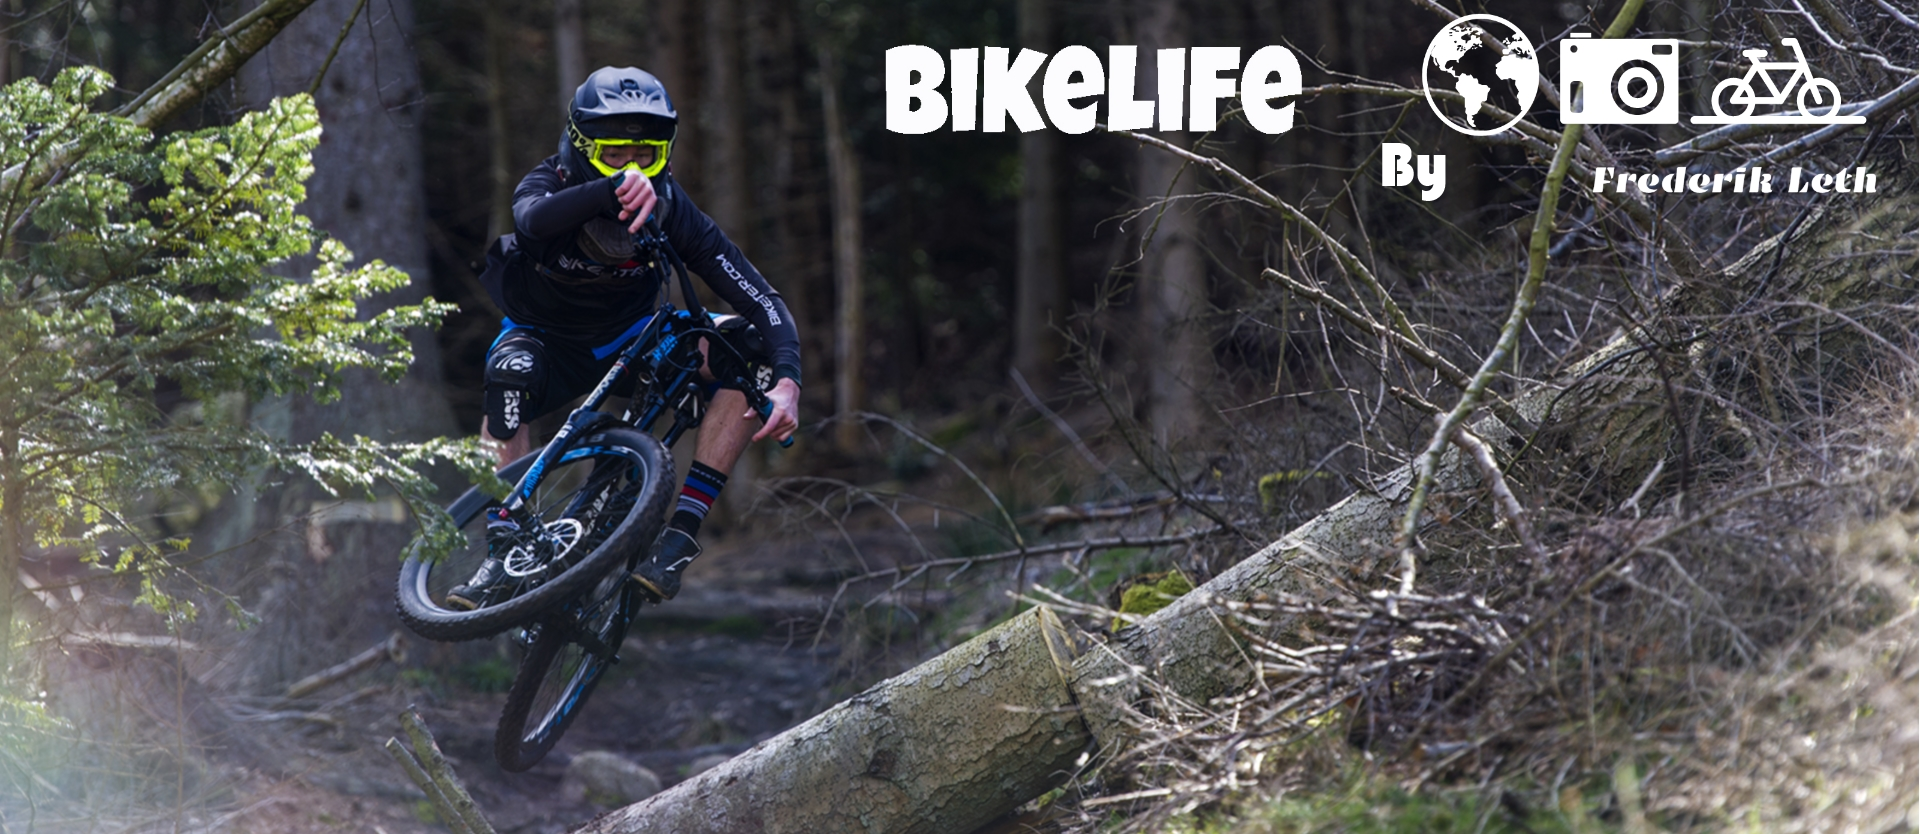 Bikelife By Frederik Leth Logo